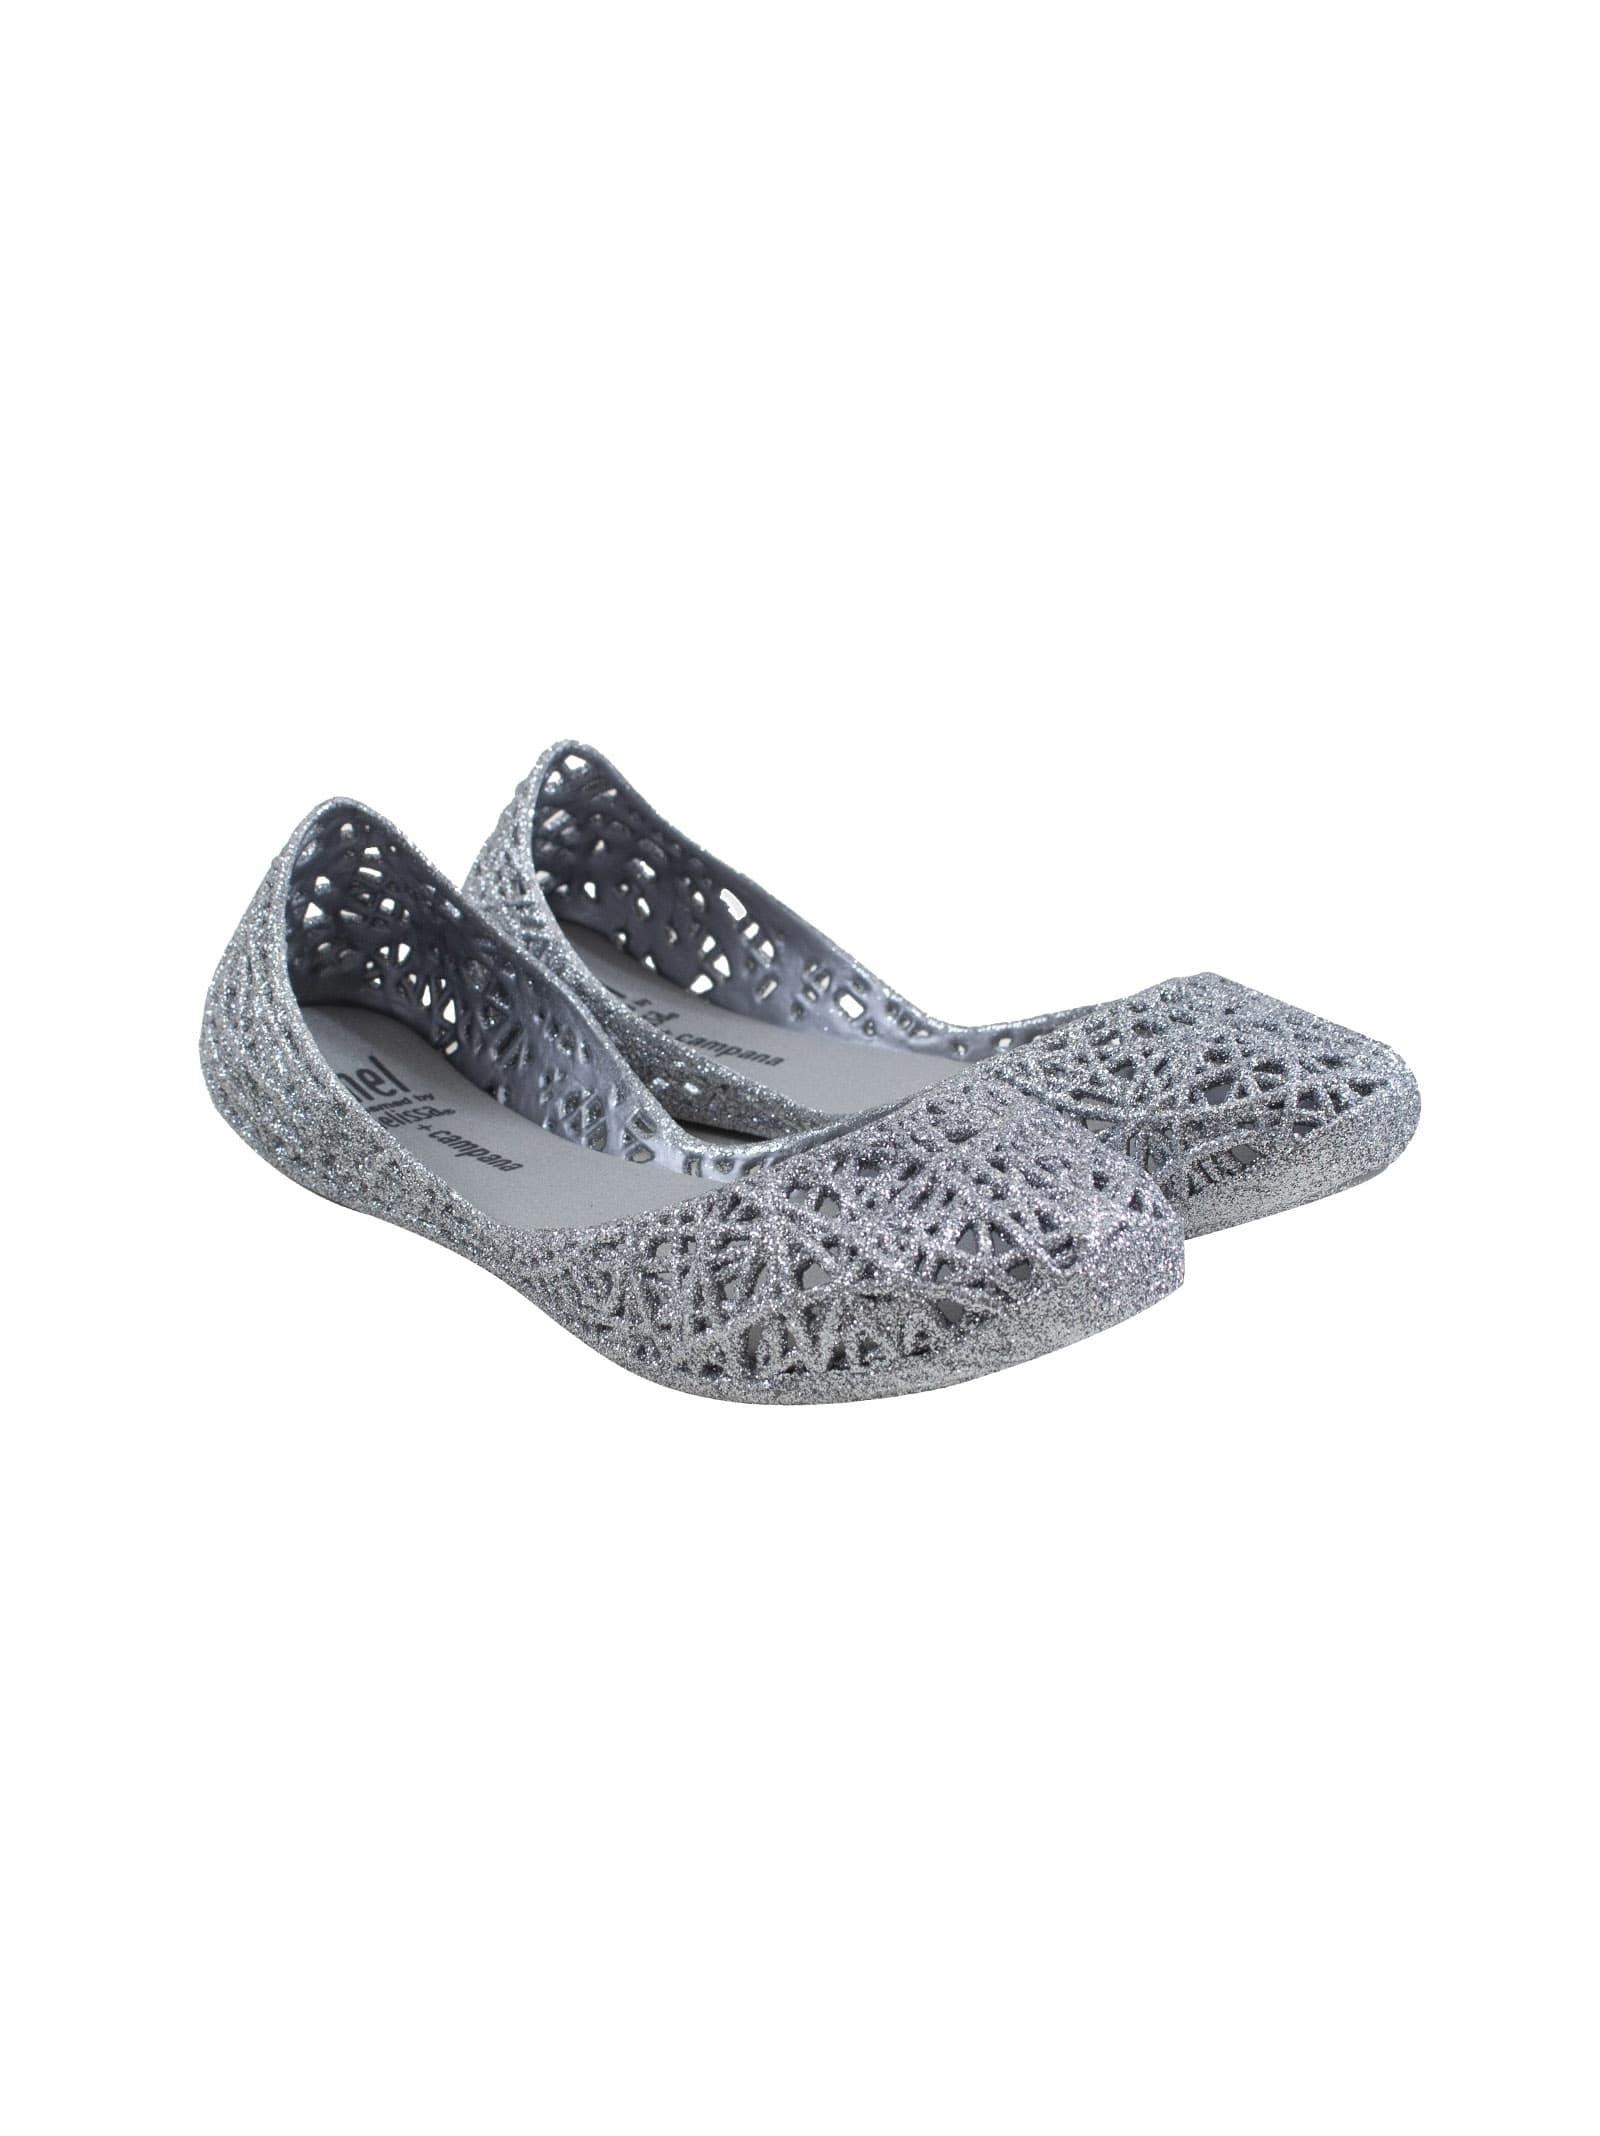 Mel Campana Zig Zag Flat Shoes